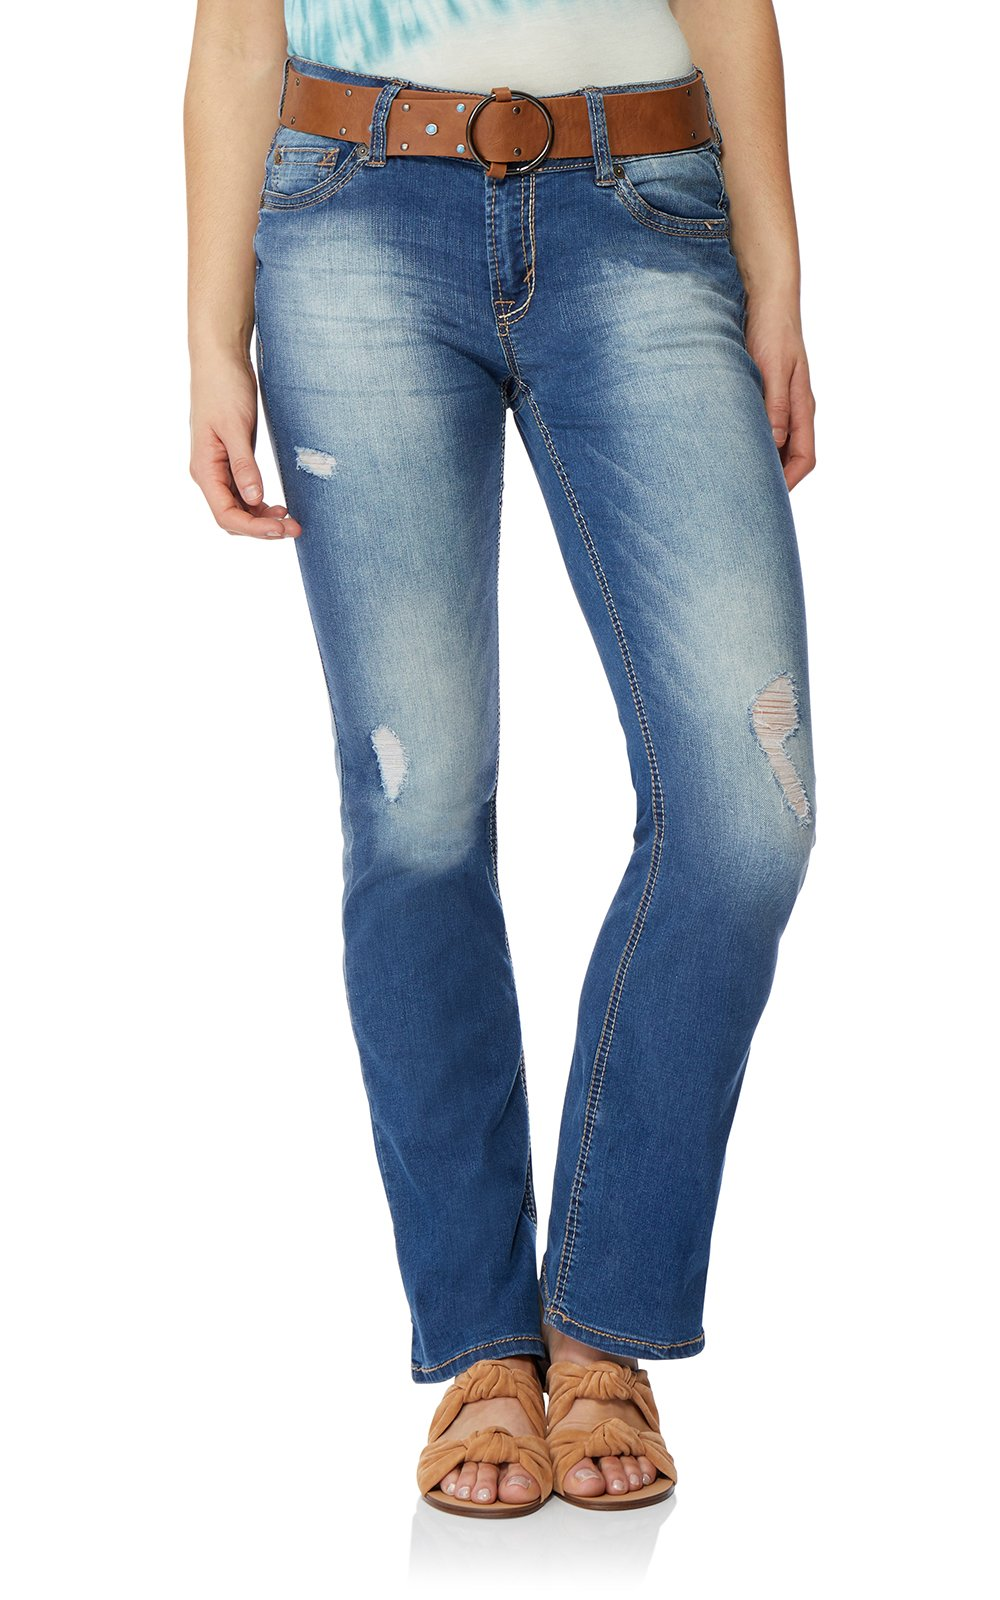 WallFlower Women's Juniors Belted Luscious Curvy Bootcut Jeans in Brodie, 3